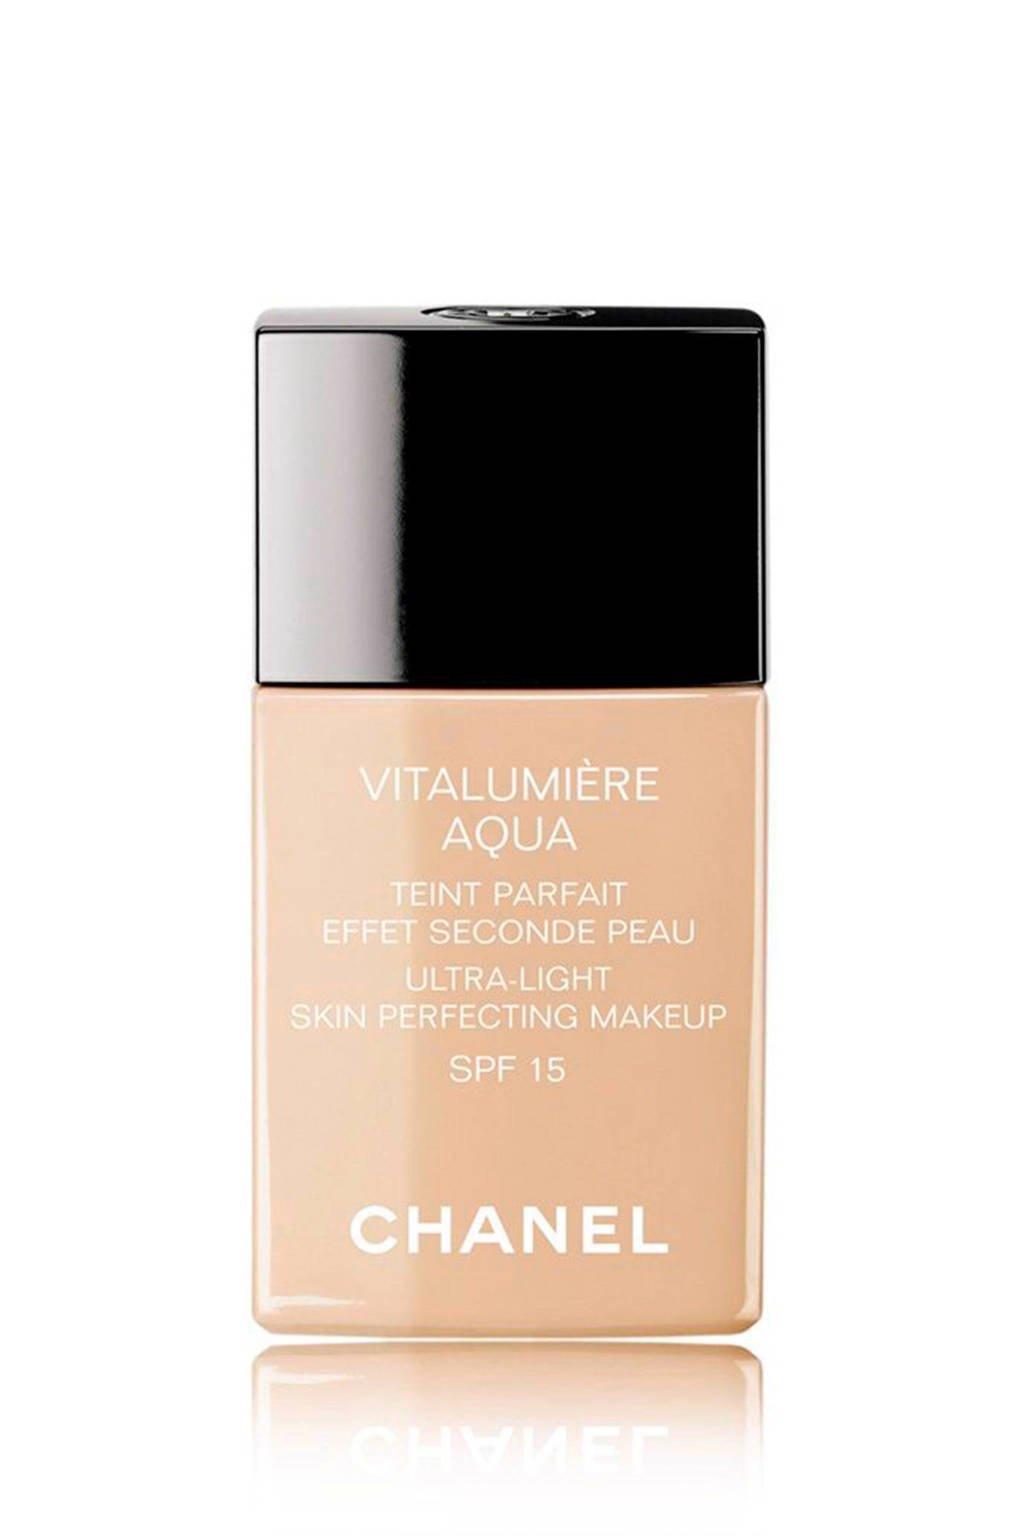 Chanel Vitalumière Aqua foundation - 70 Beige